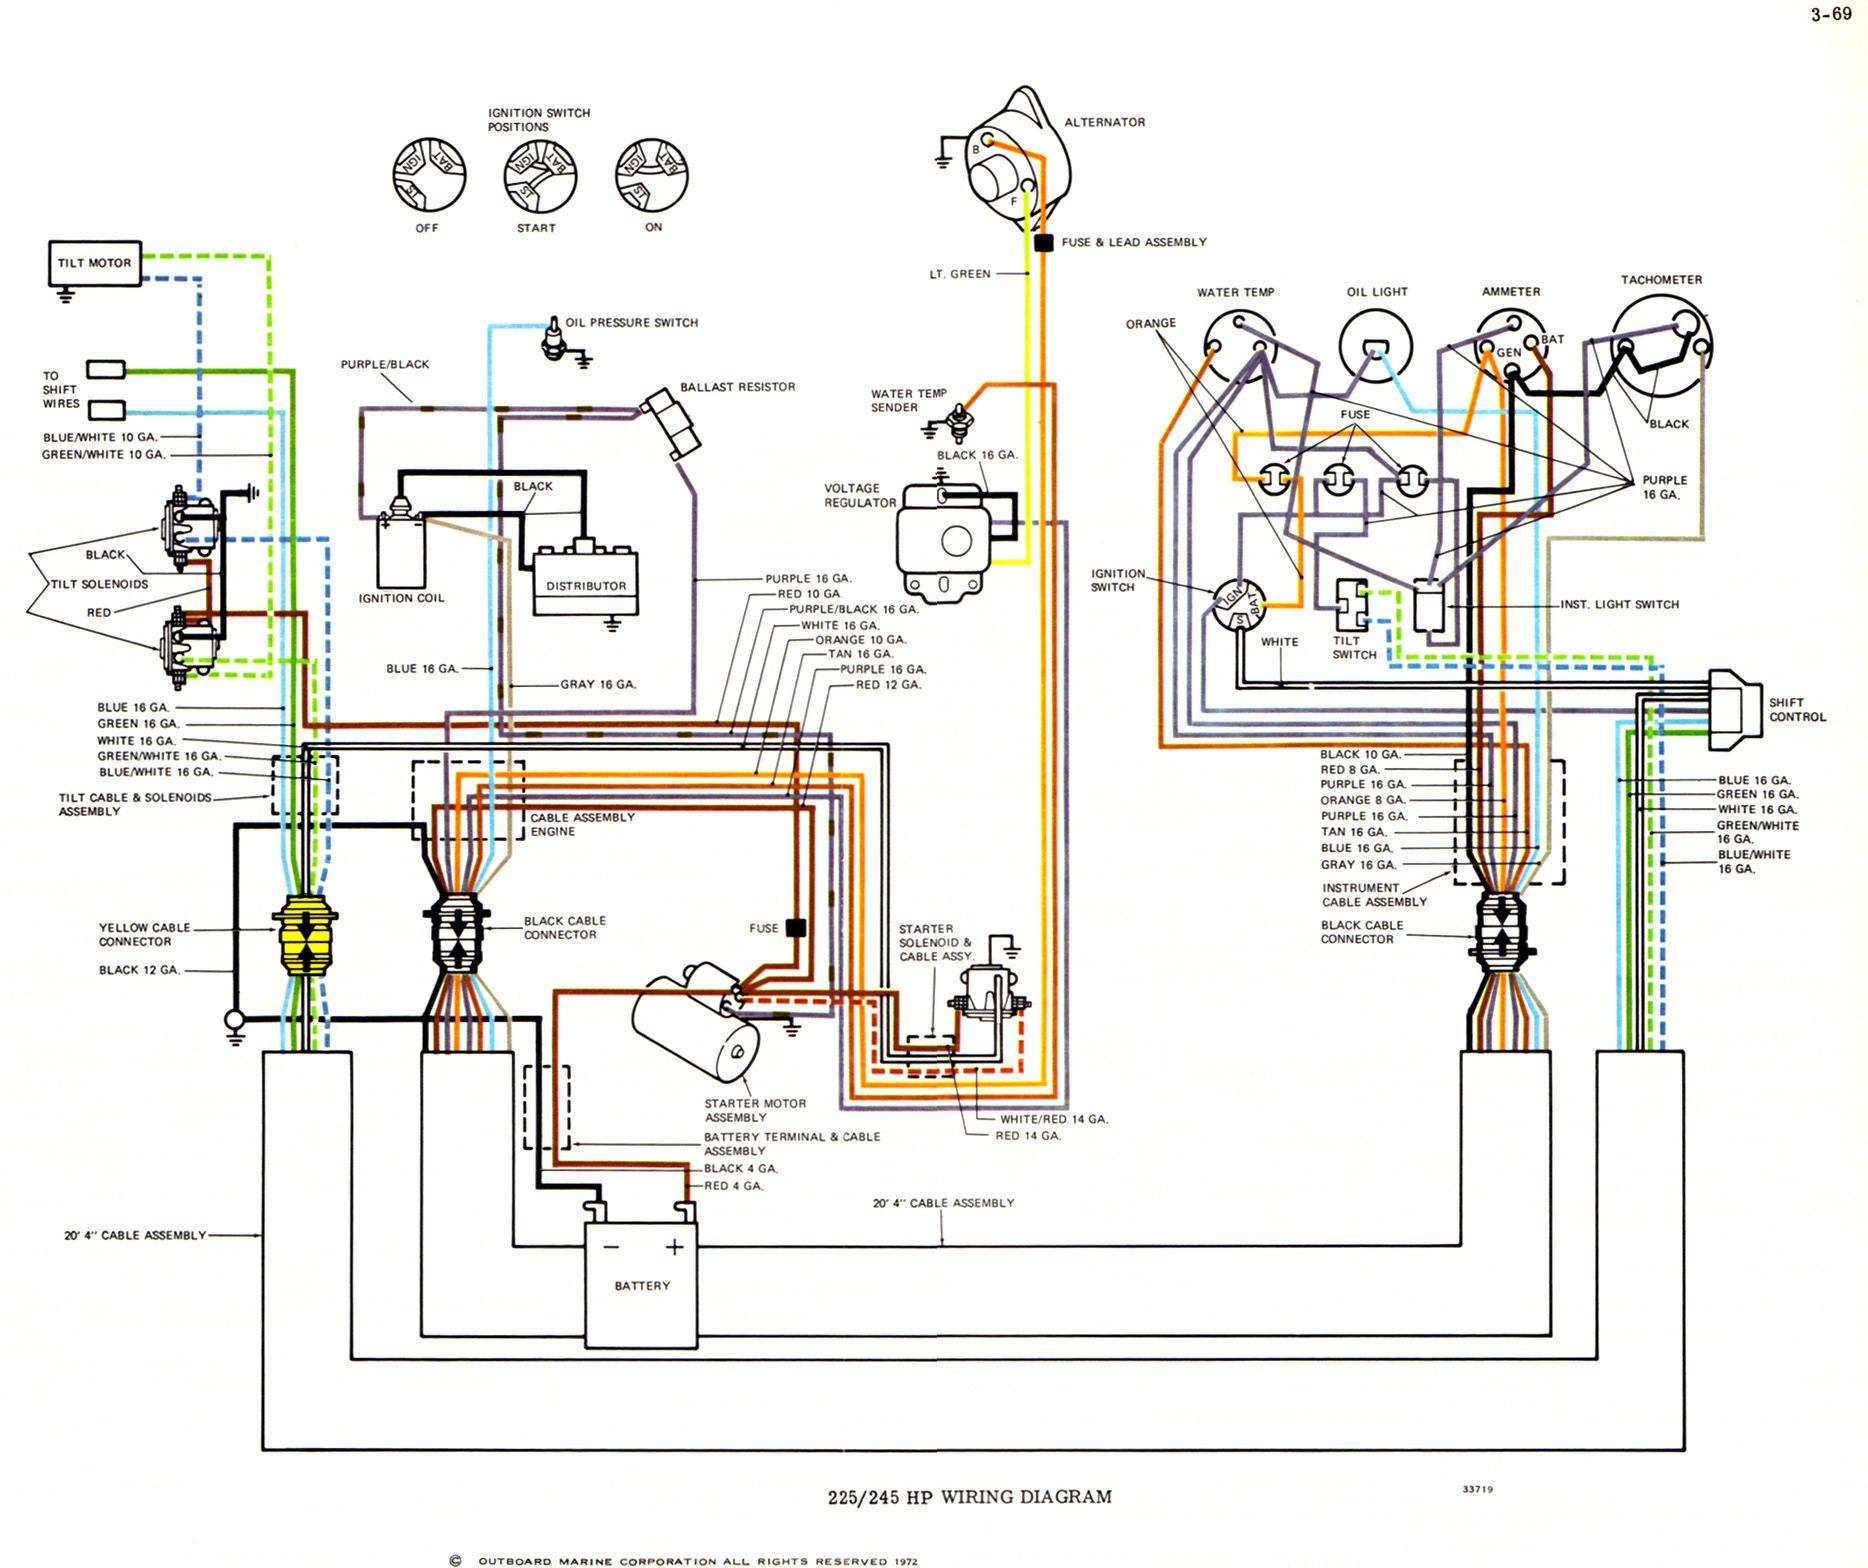 hight resolution of yamaha jet boat wiring diagram wiring diagrams for yamaha boat speaker wiring yamaha boat wiring